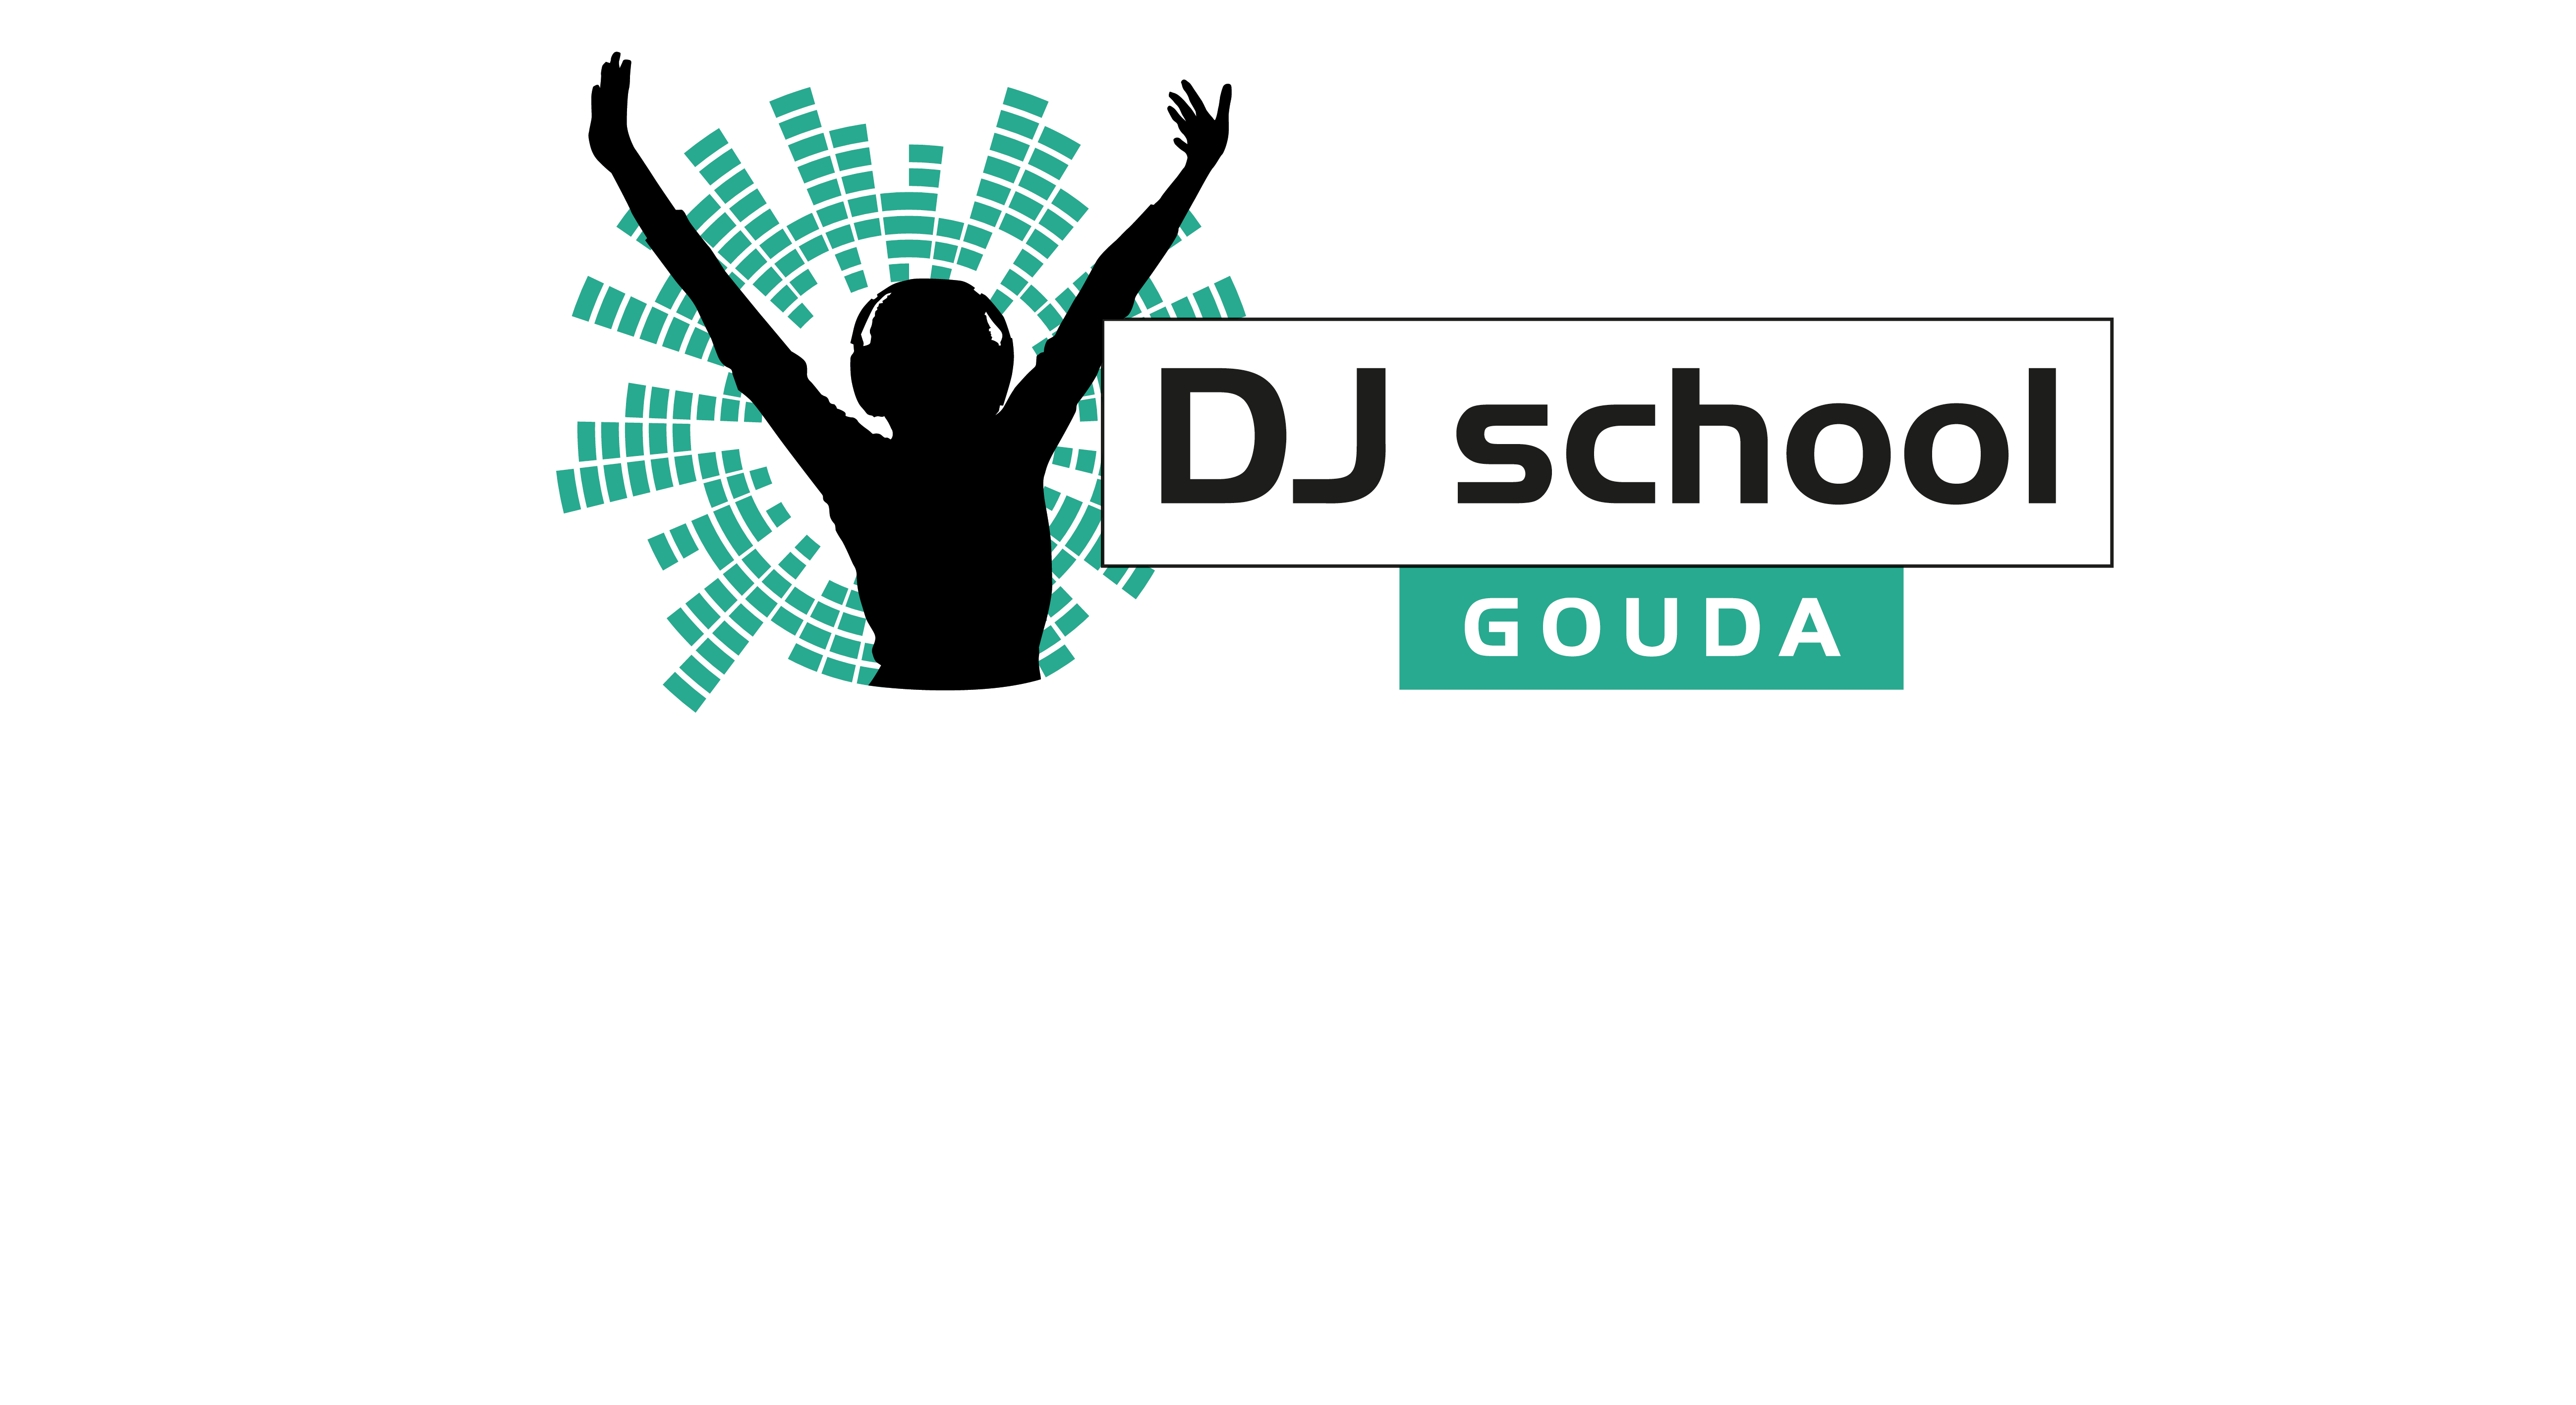 DJ School Gouda